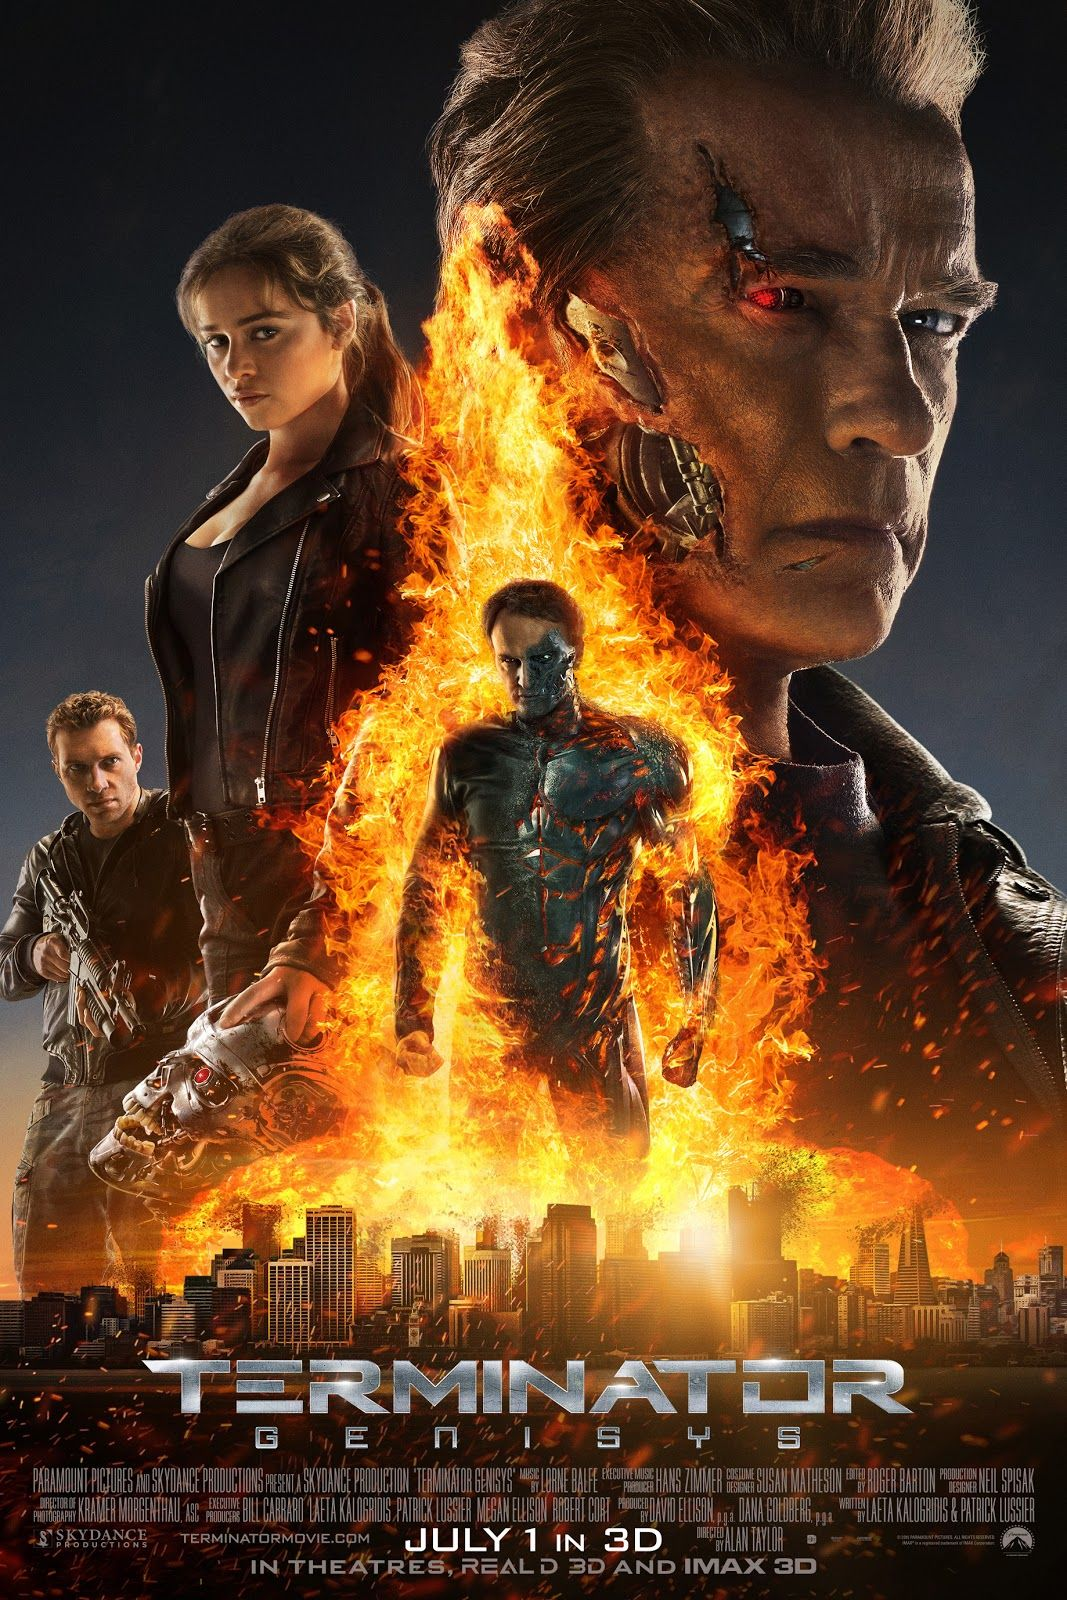 Saga Terminator Hd Pesado Bdrip Dual Soundtracks Peliculas En Cartelera Ver Peliculas Online Terminator Génesis